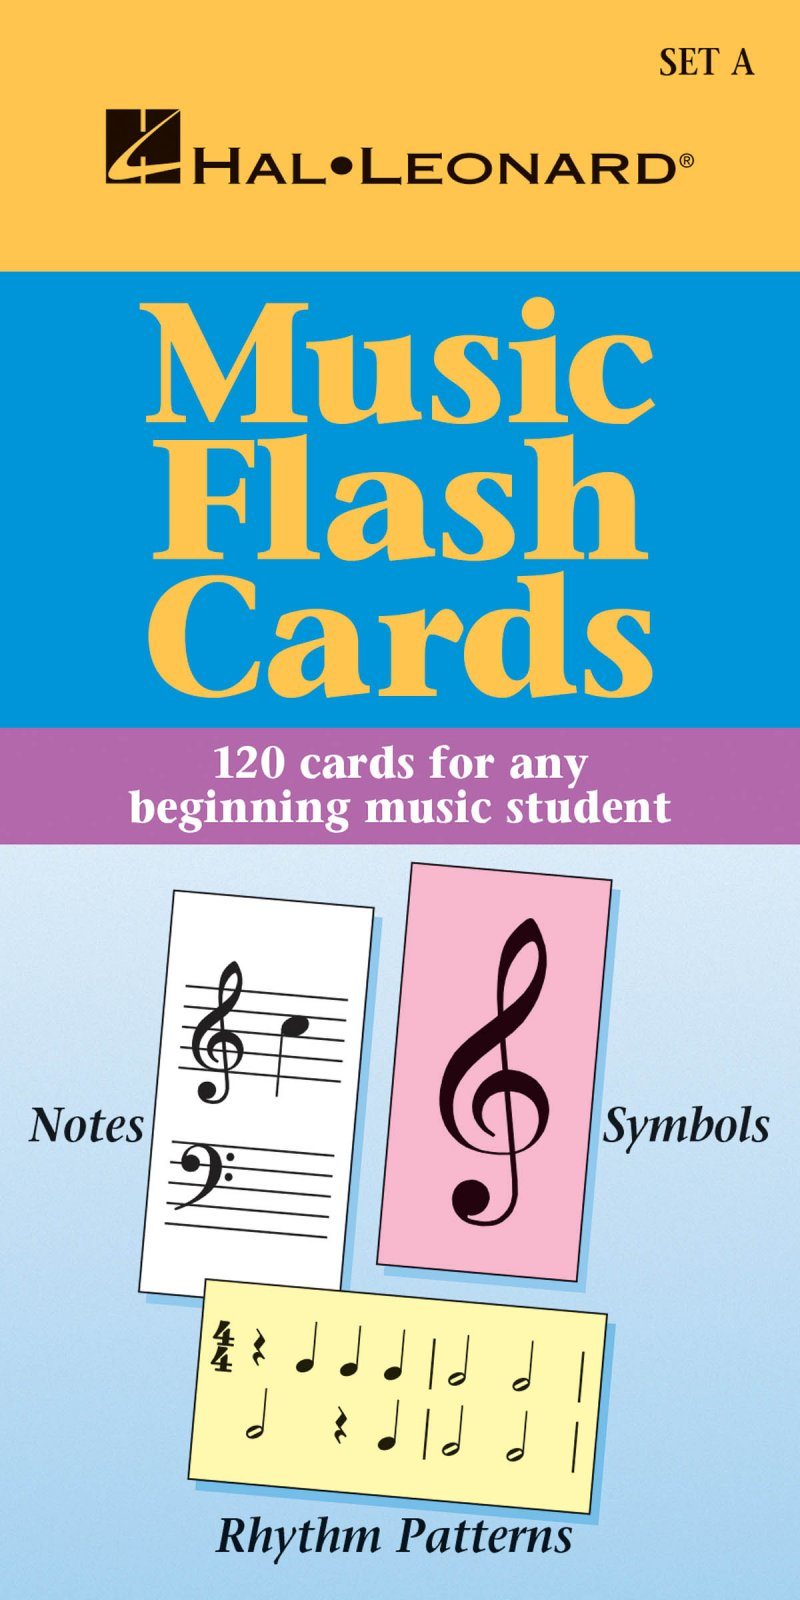 Hal Leonard Music Flash Cards ? Set A